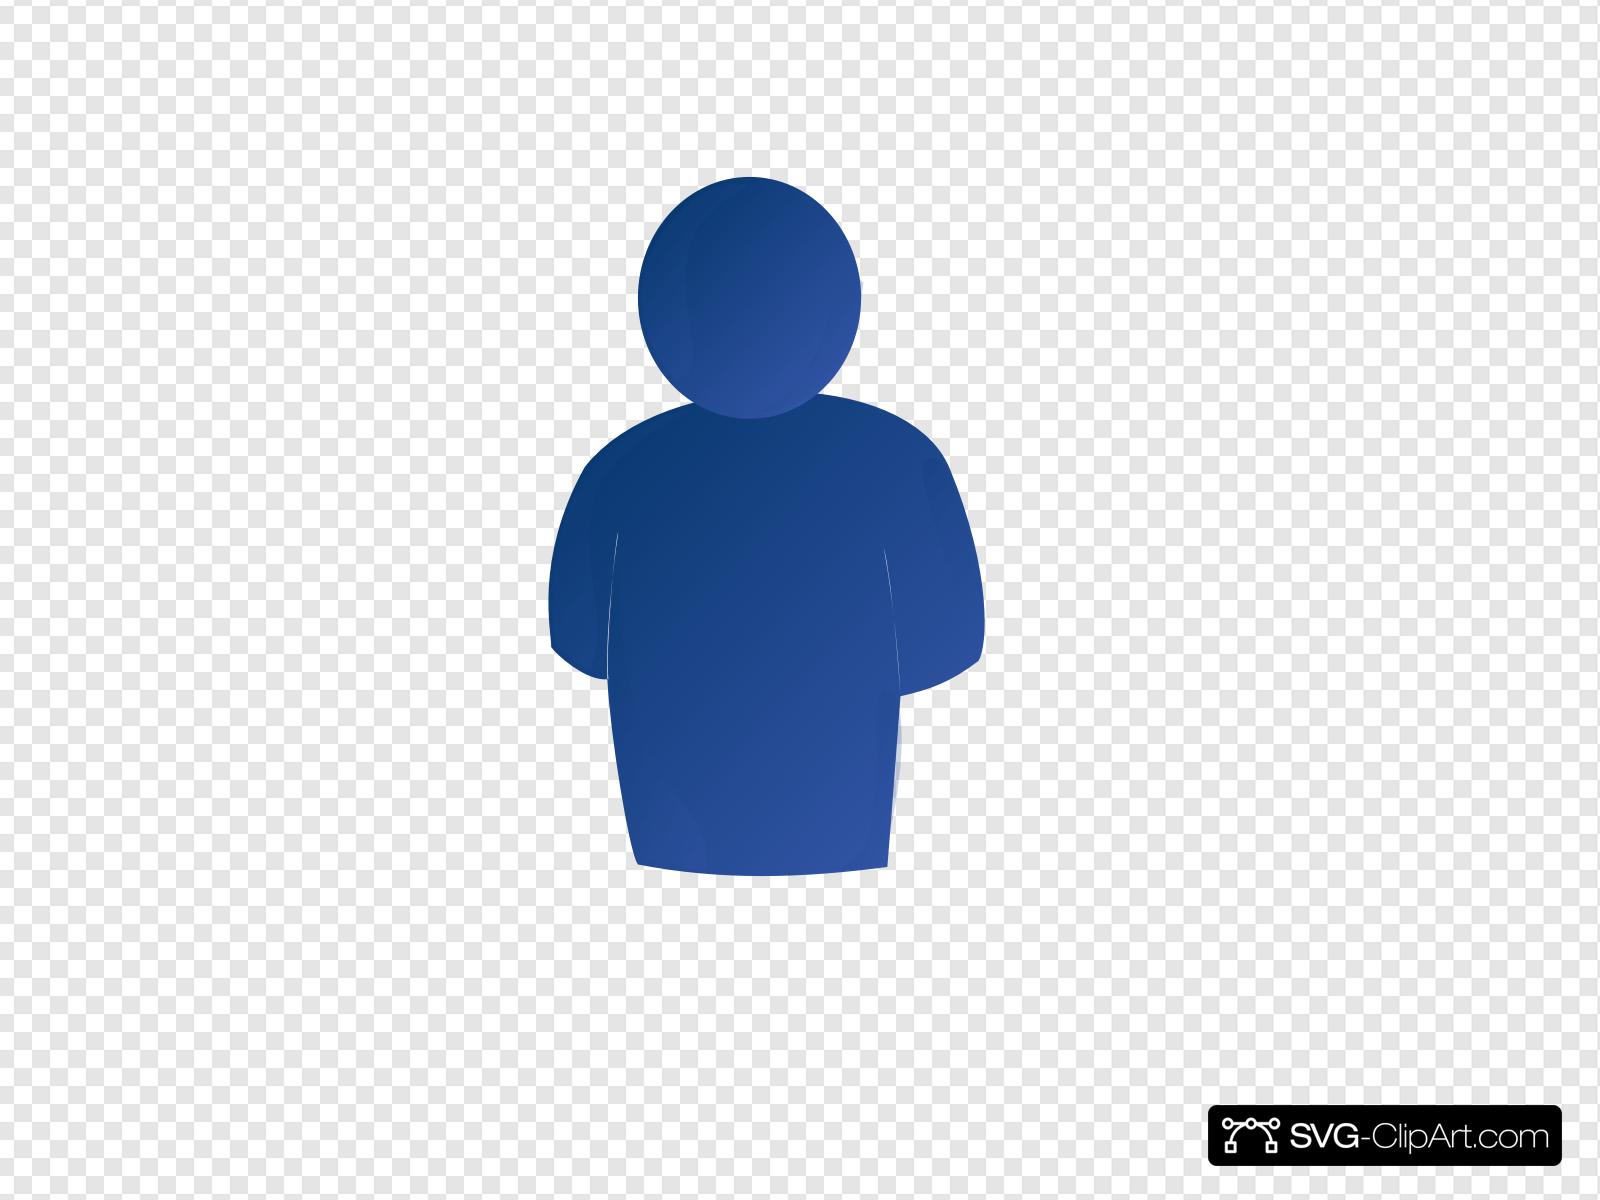 Blue person clipart image transparent Blue Person No Shadow Clip art, Icon and SVG - SVG Clipart image transparent